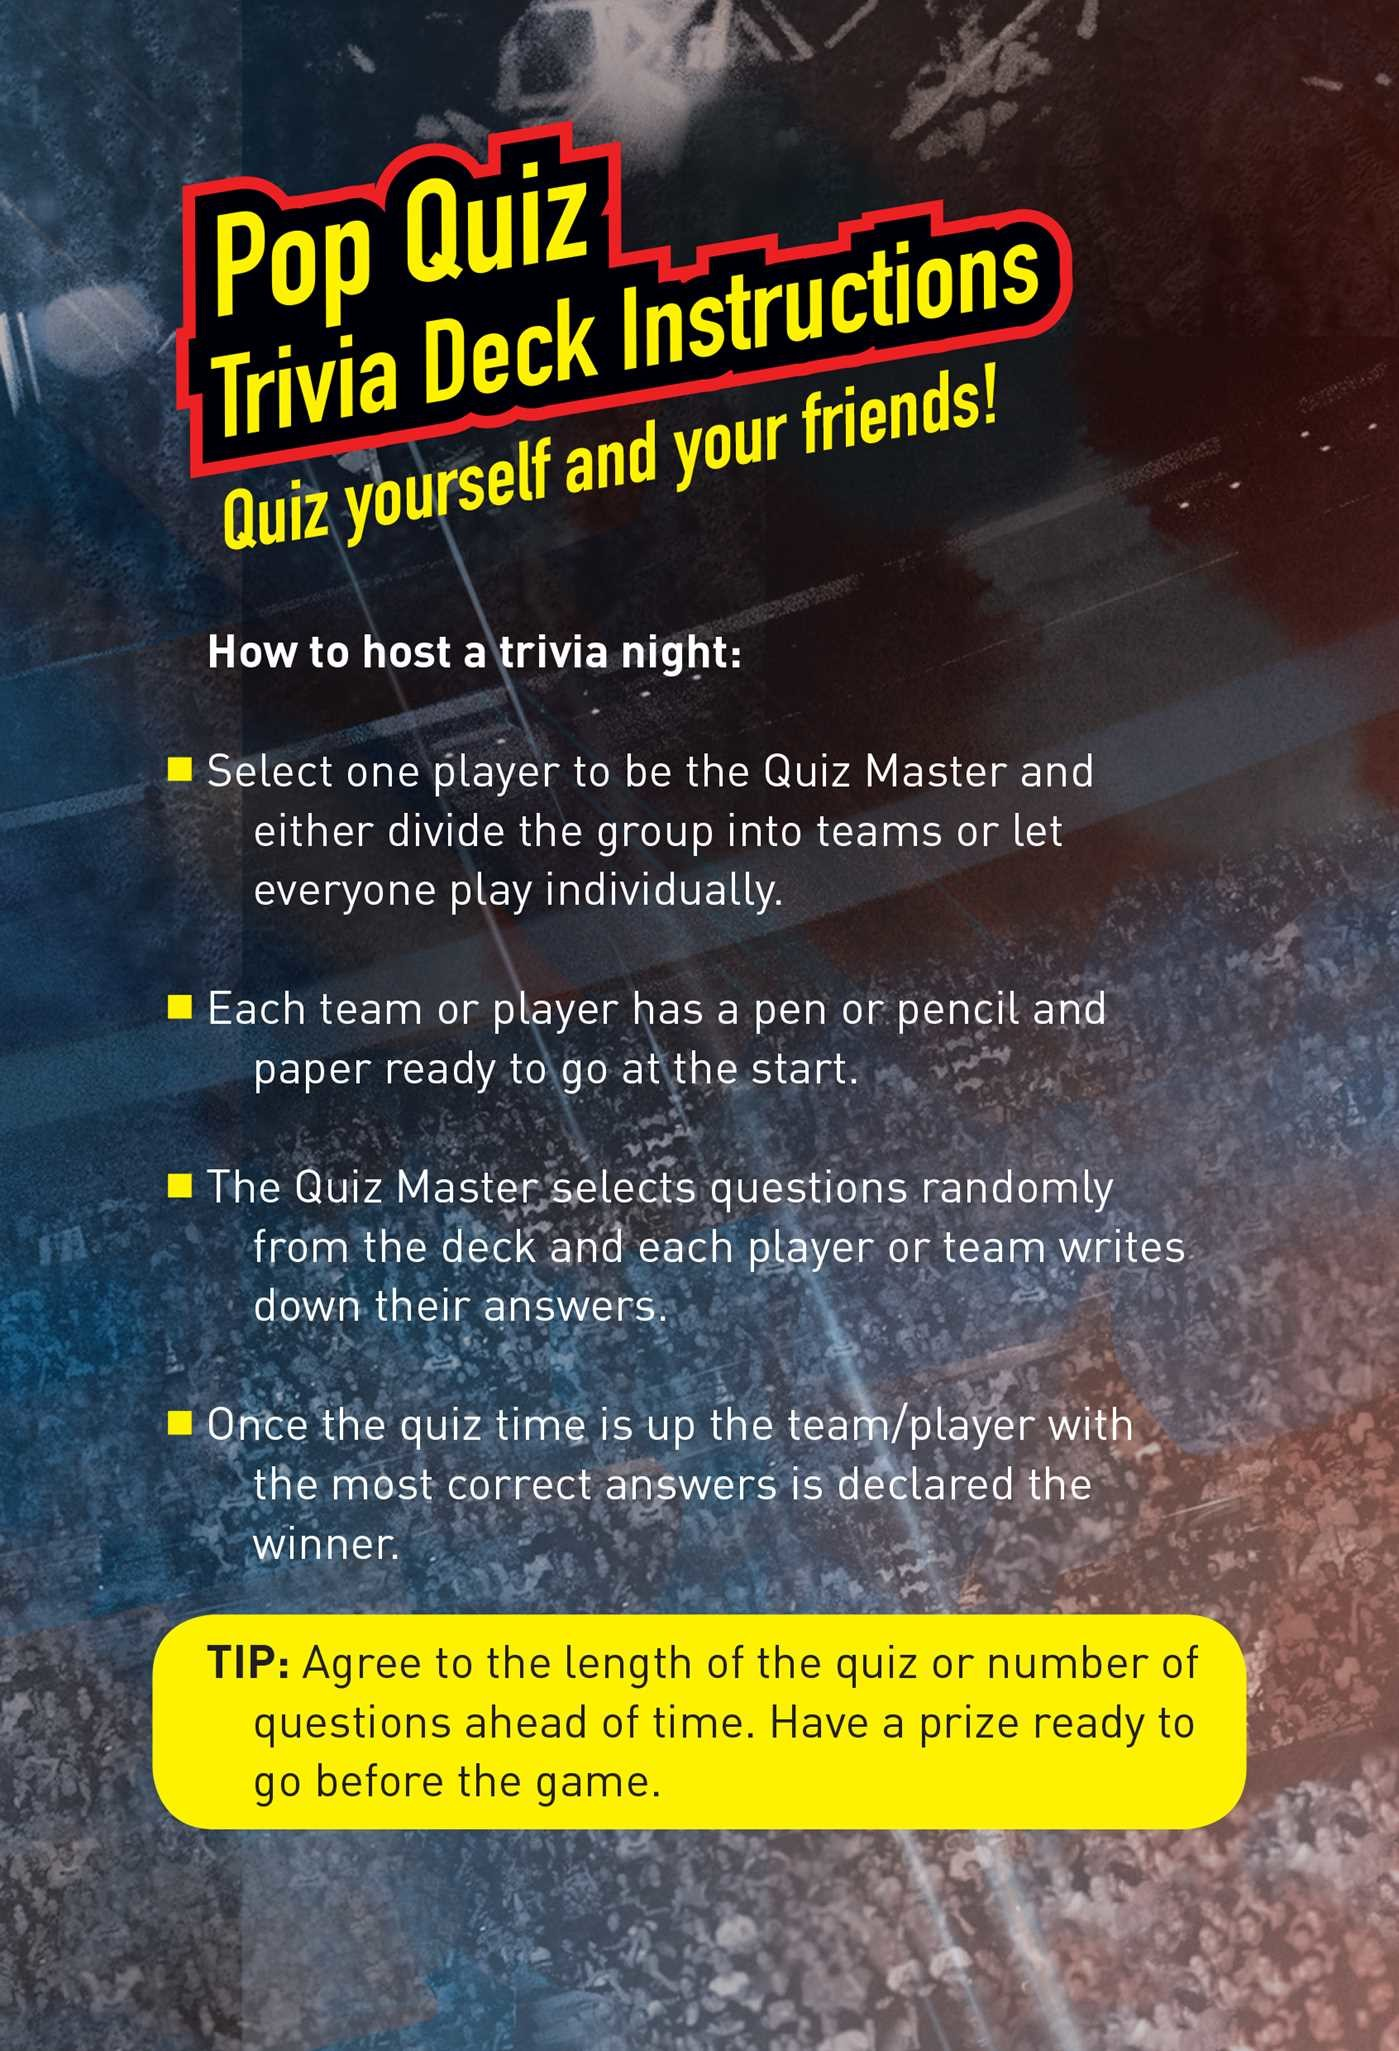 Wwe pop quiz trivia deck 9781683834410.in03